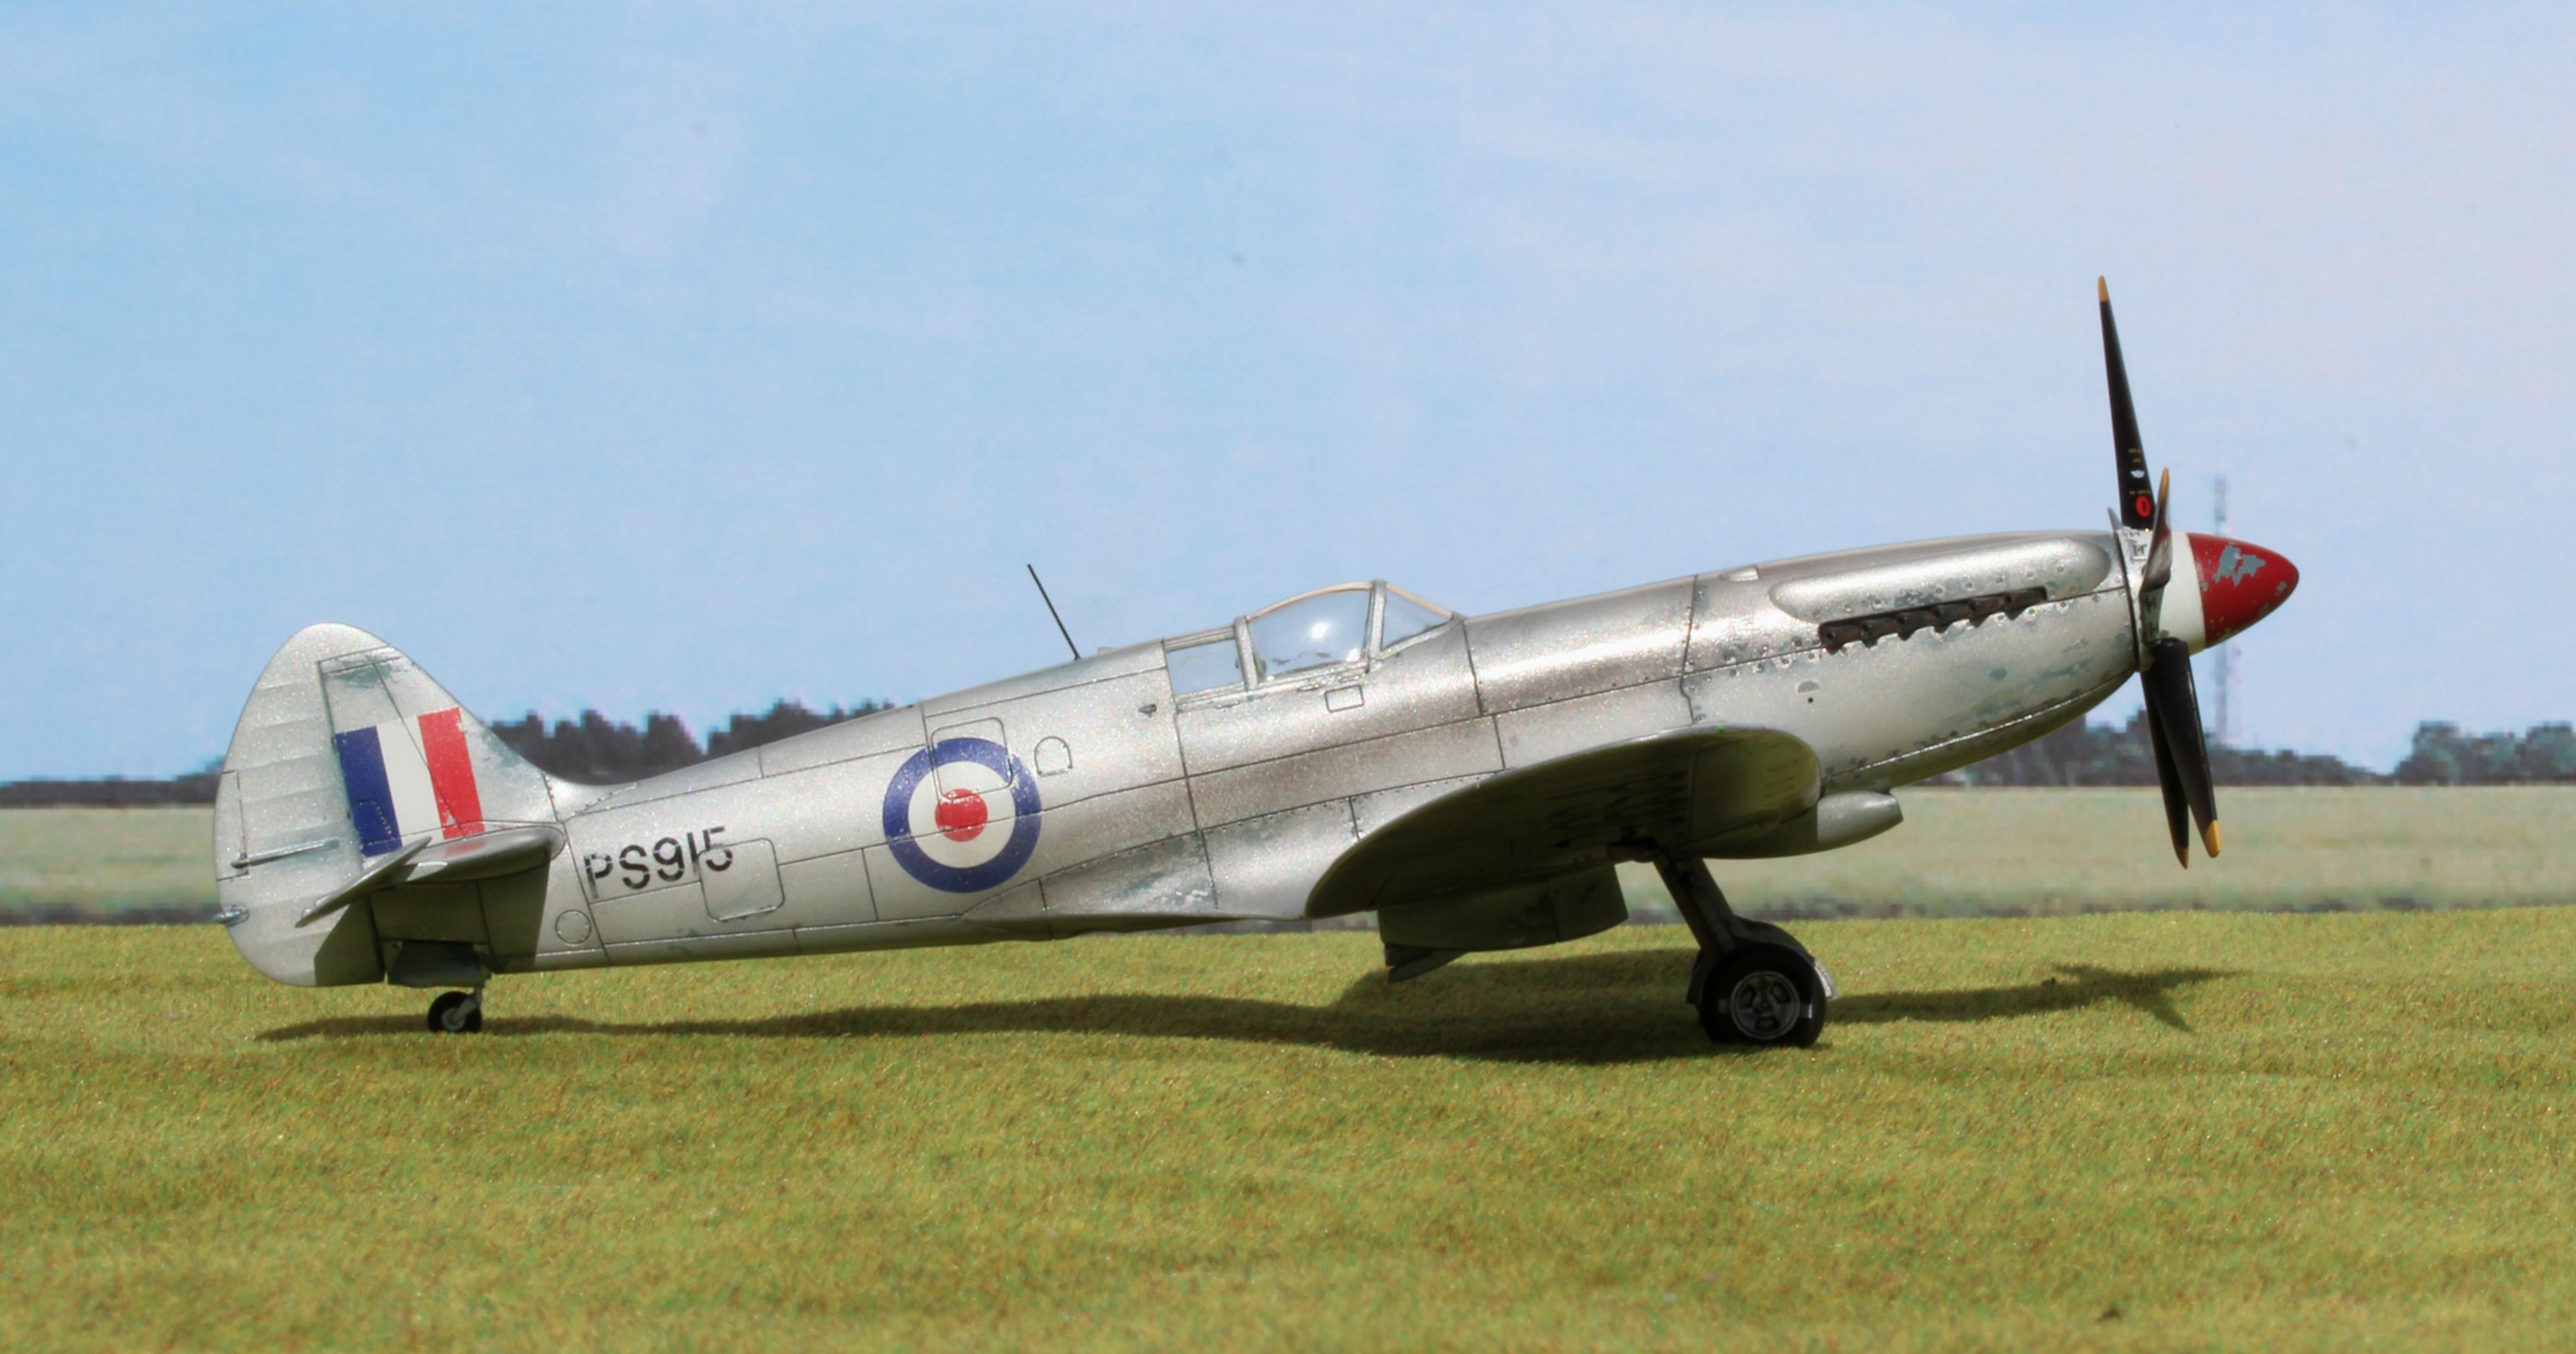 Edited image of Spitfire Mk XIX